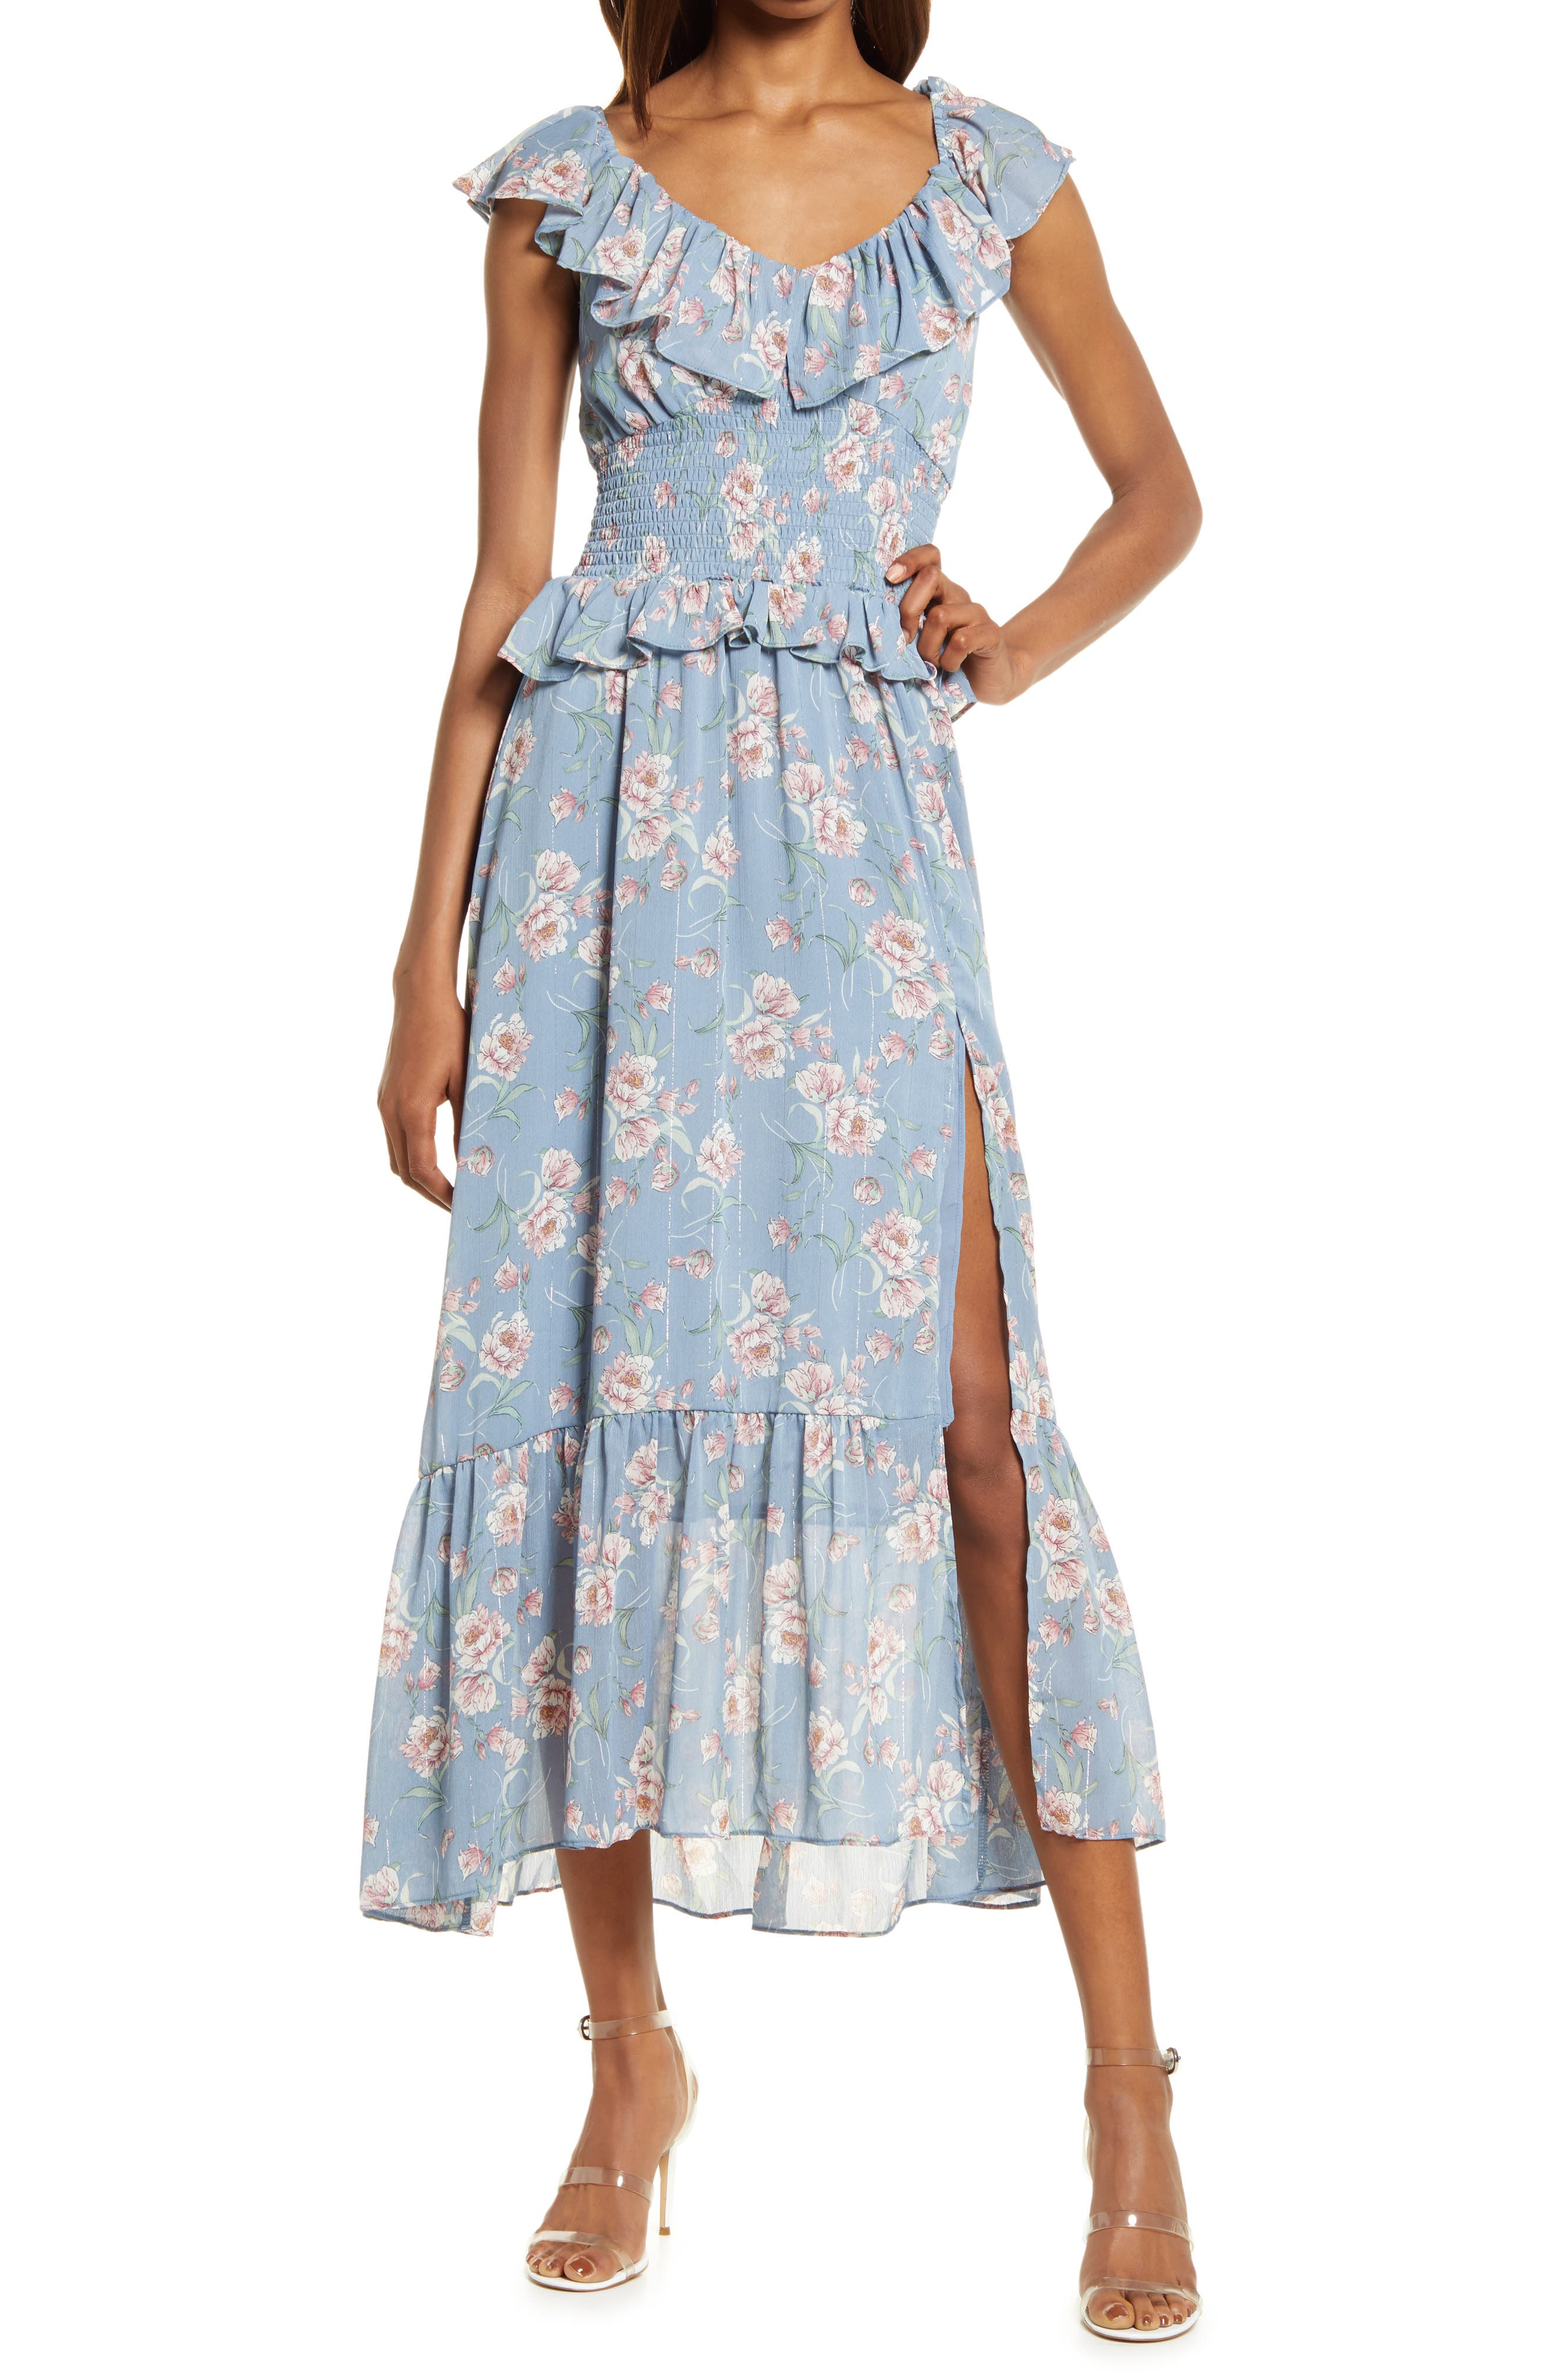 Luna Floral Smocked Midi Dress